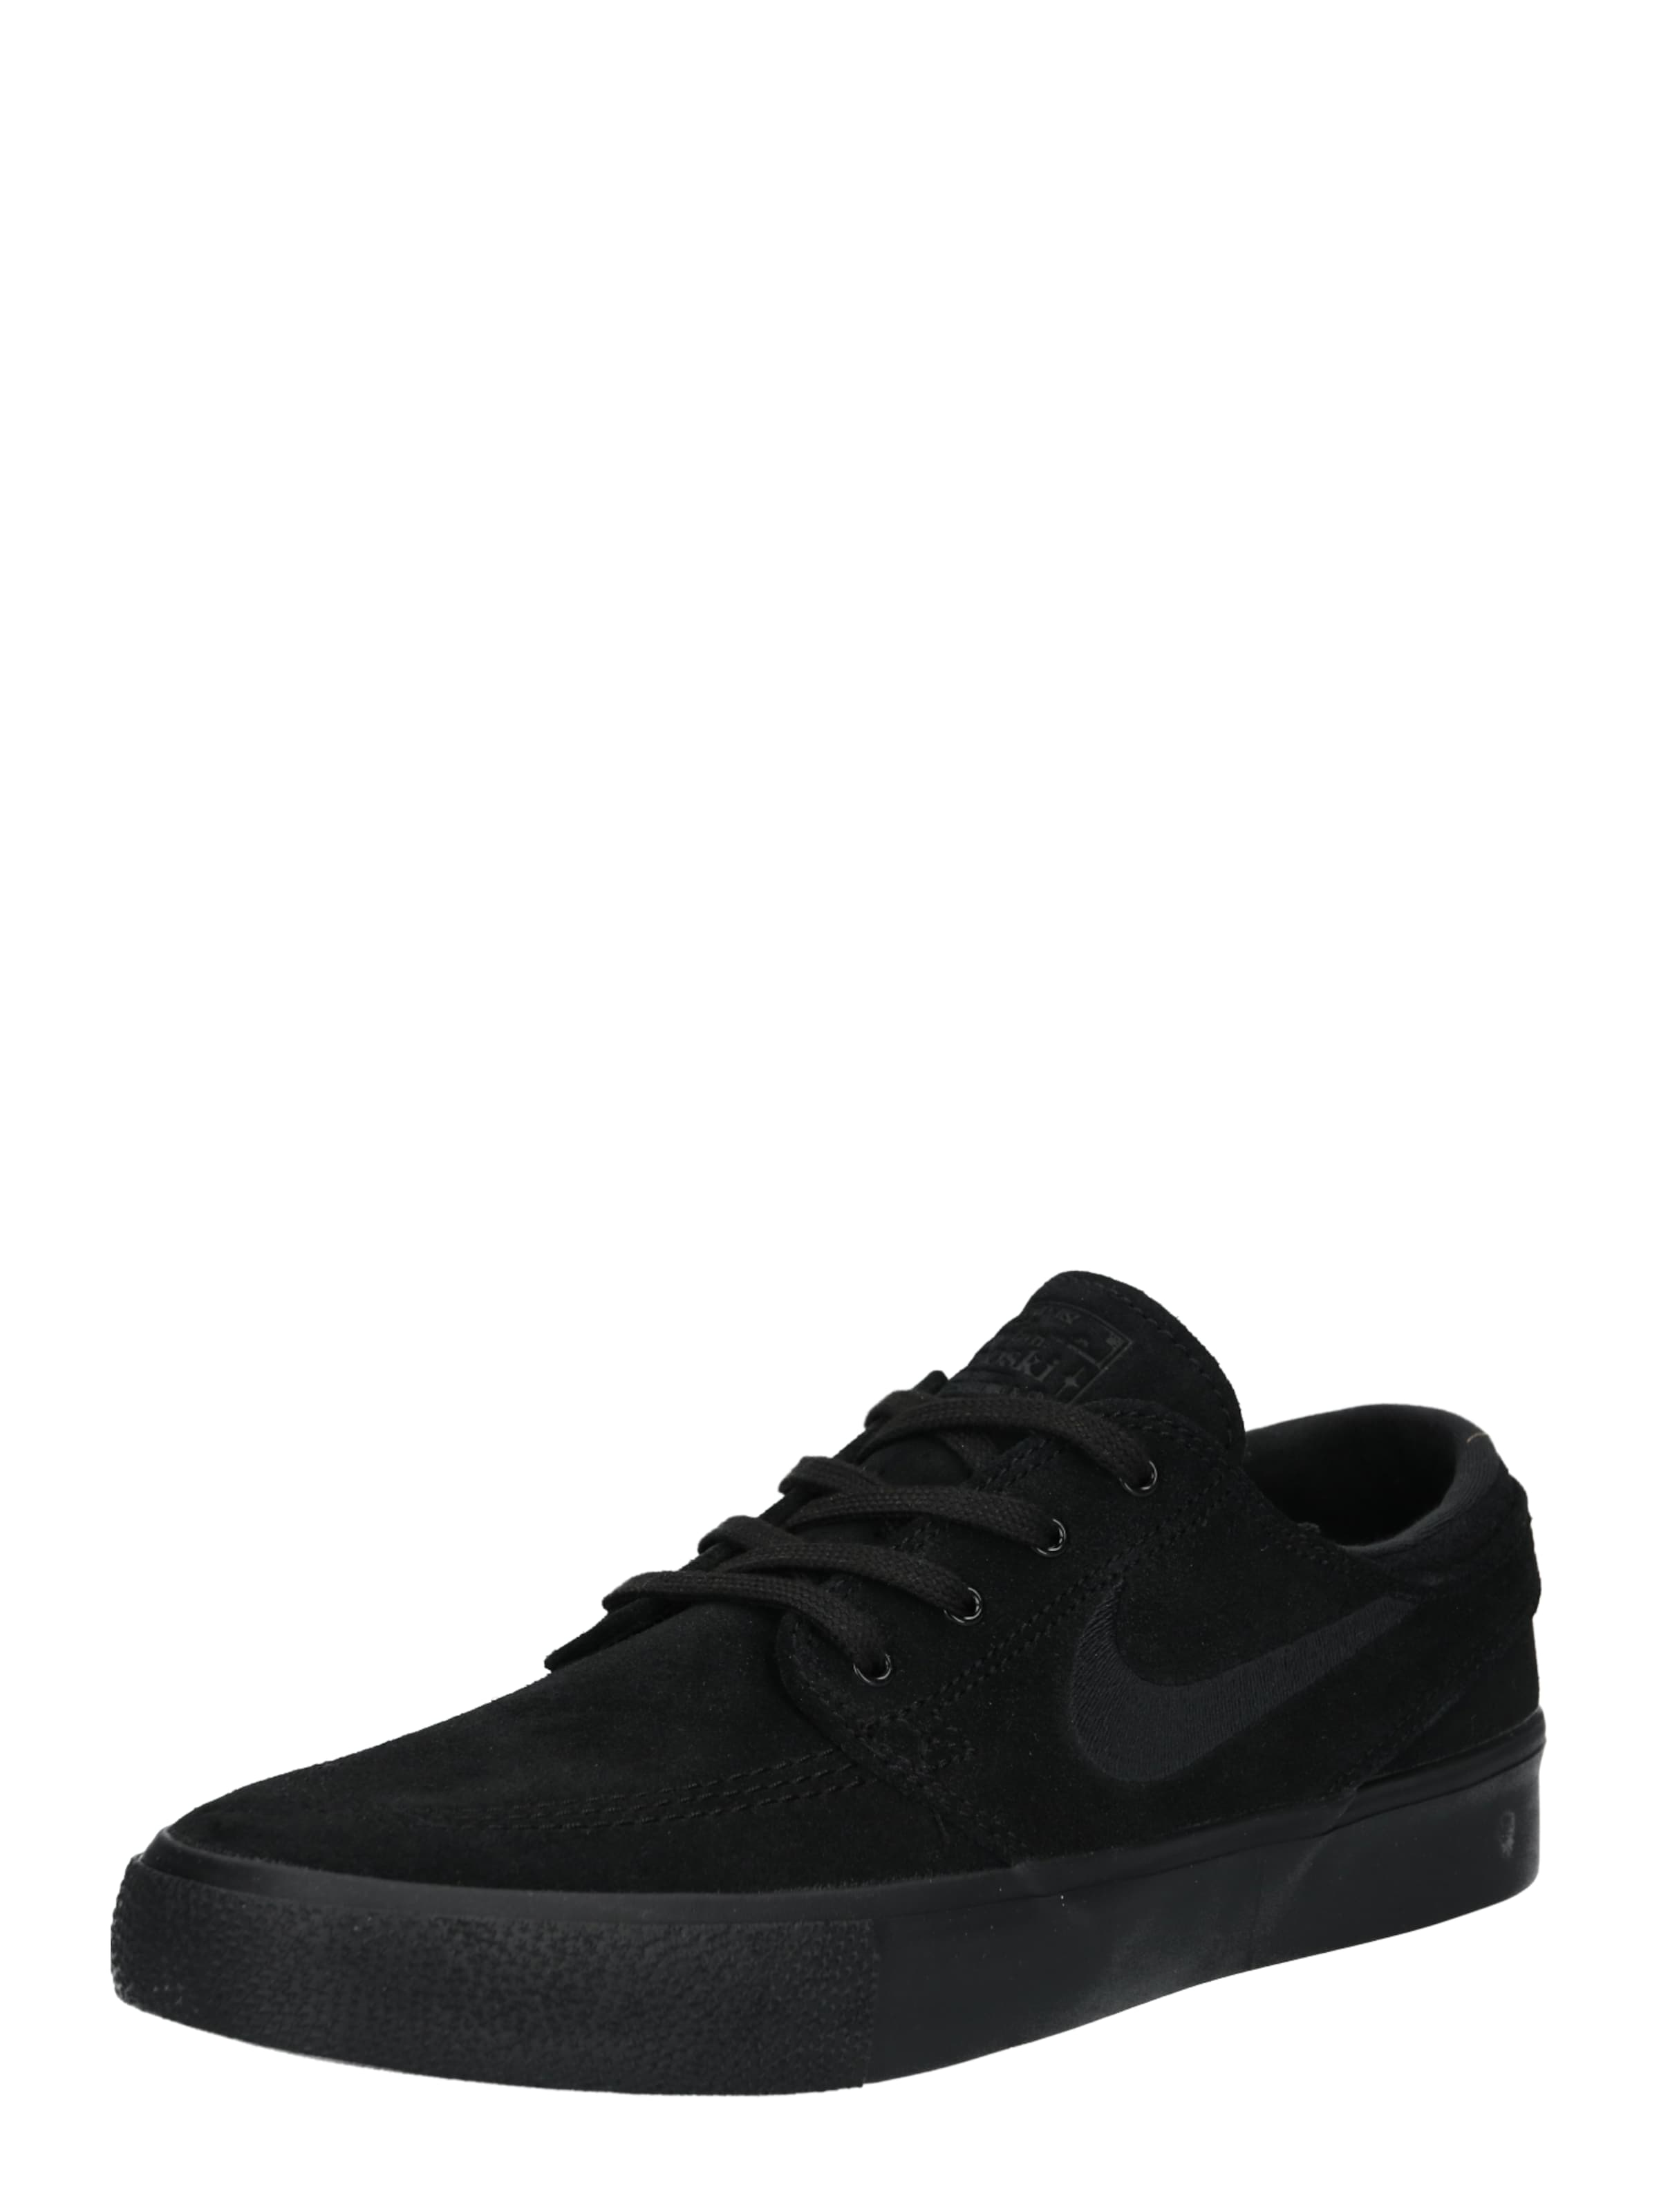 Rm' Sneaker Sb ' Schwarz Nike Janoski In zUMGSVqp